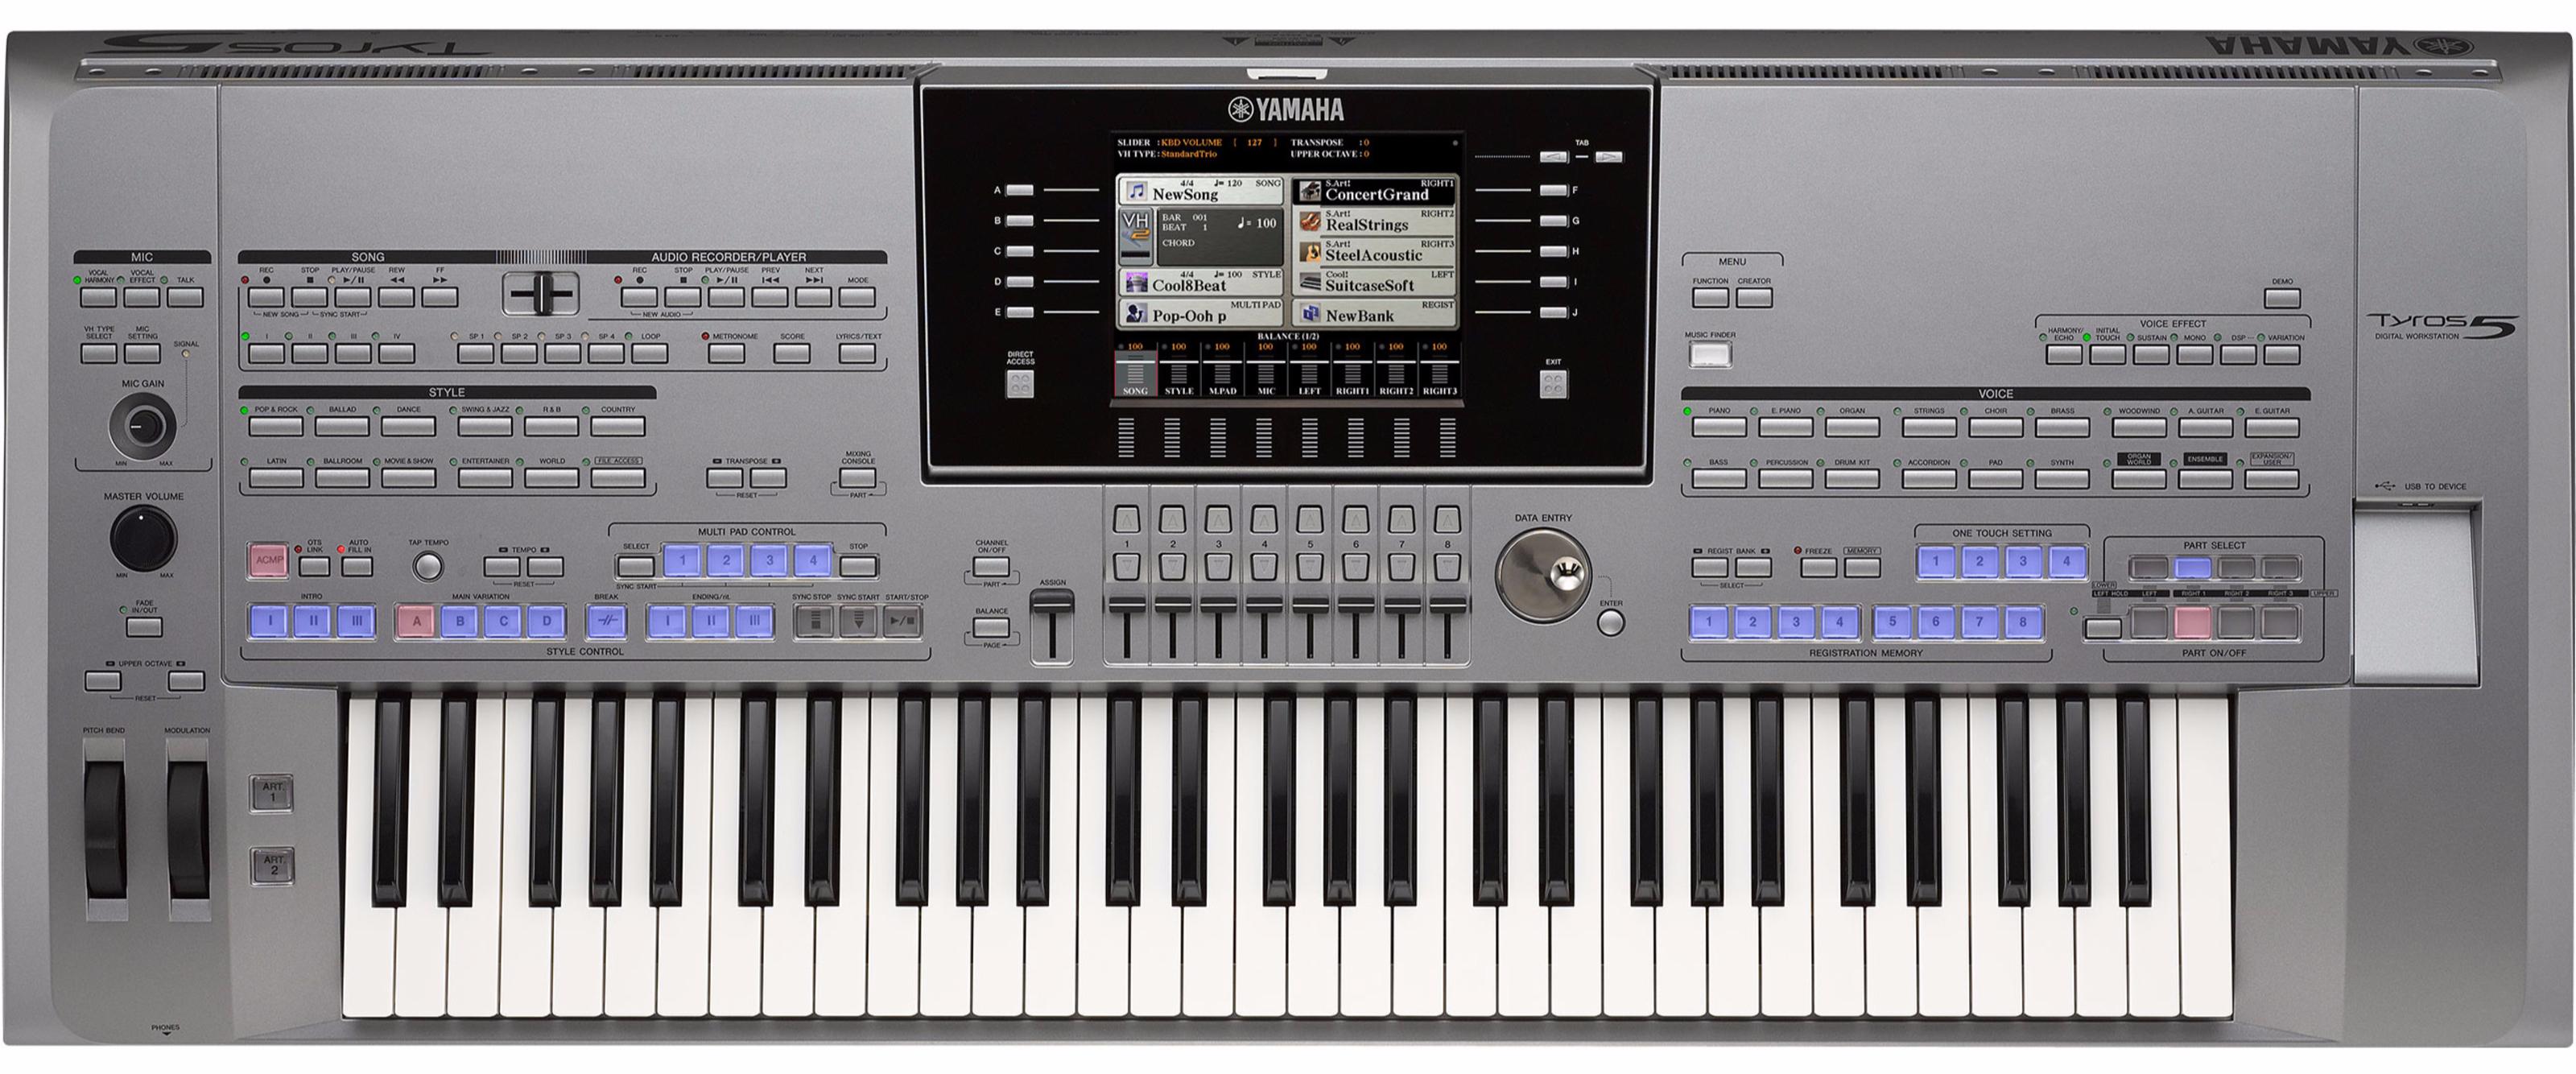 Vintage Yamaha  Key Keyboard